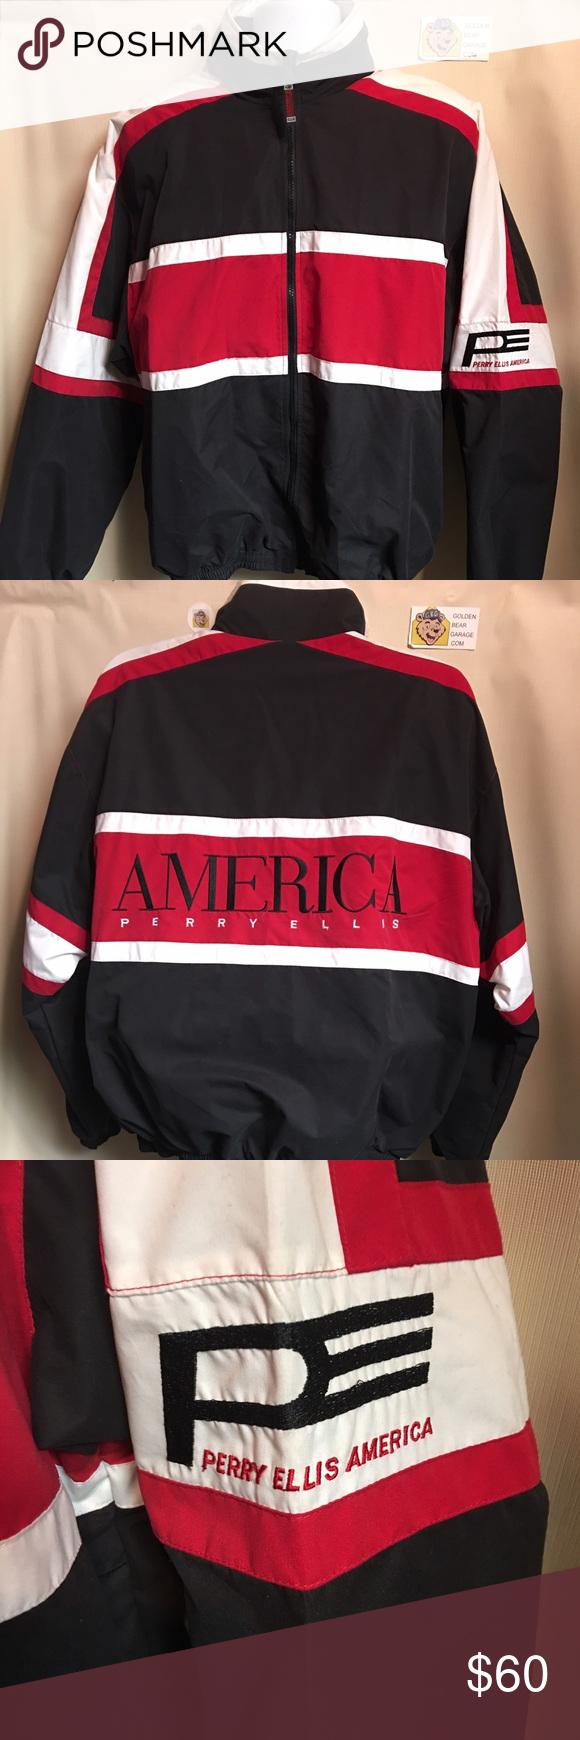 e0ddebcdbc Vintage Perry Ellis America Men s Large Jacket Gently Worn Men s Large Vintage  Perry Ellis America Jacket. In great condition with no major flaws.